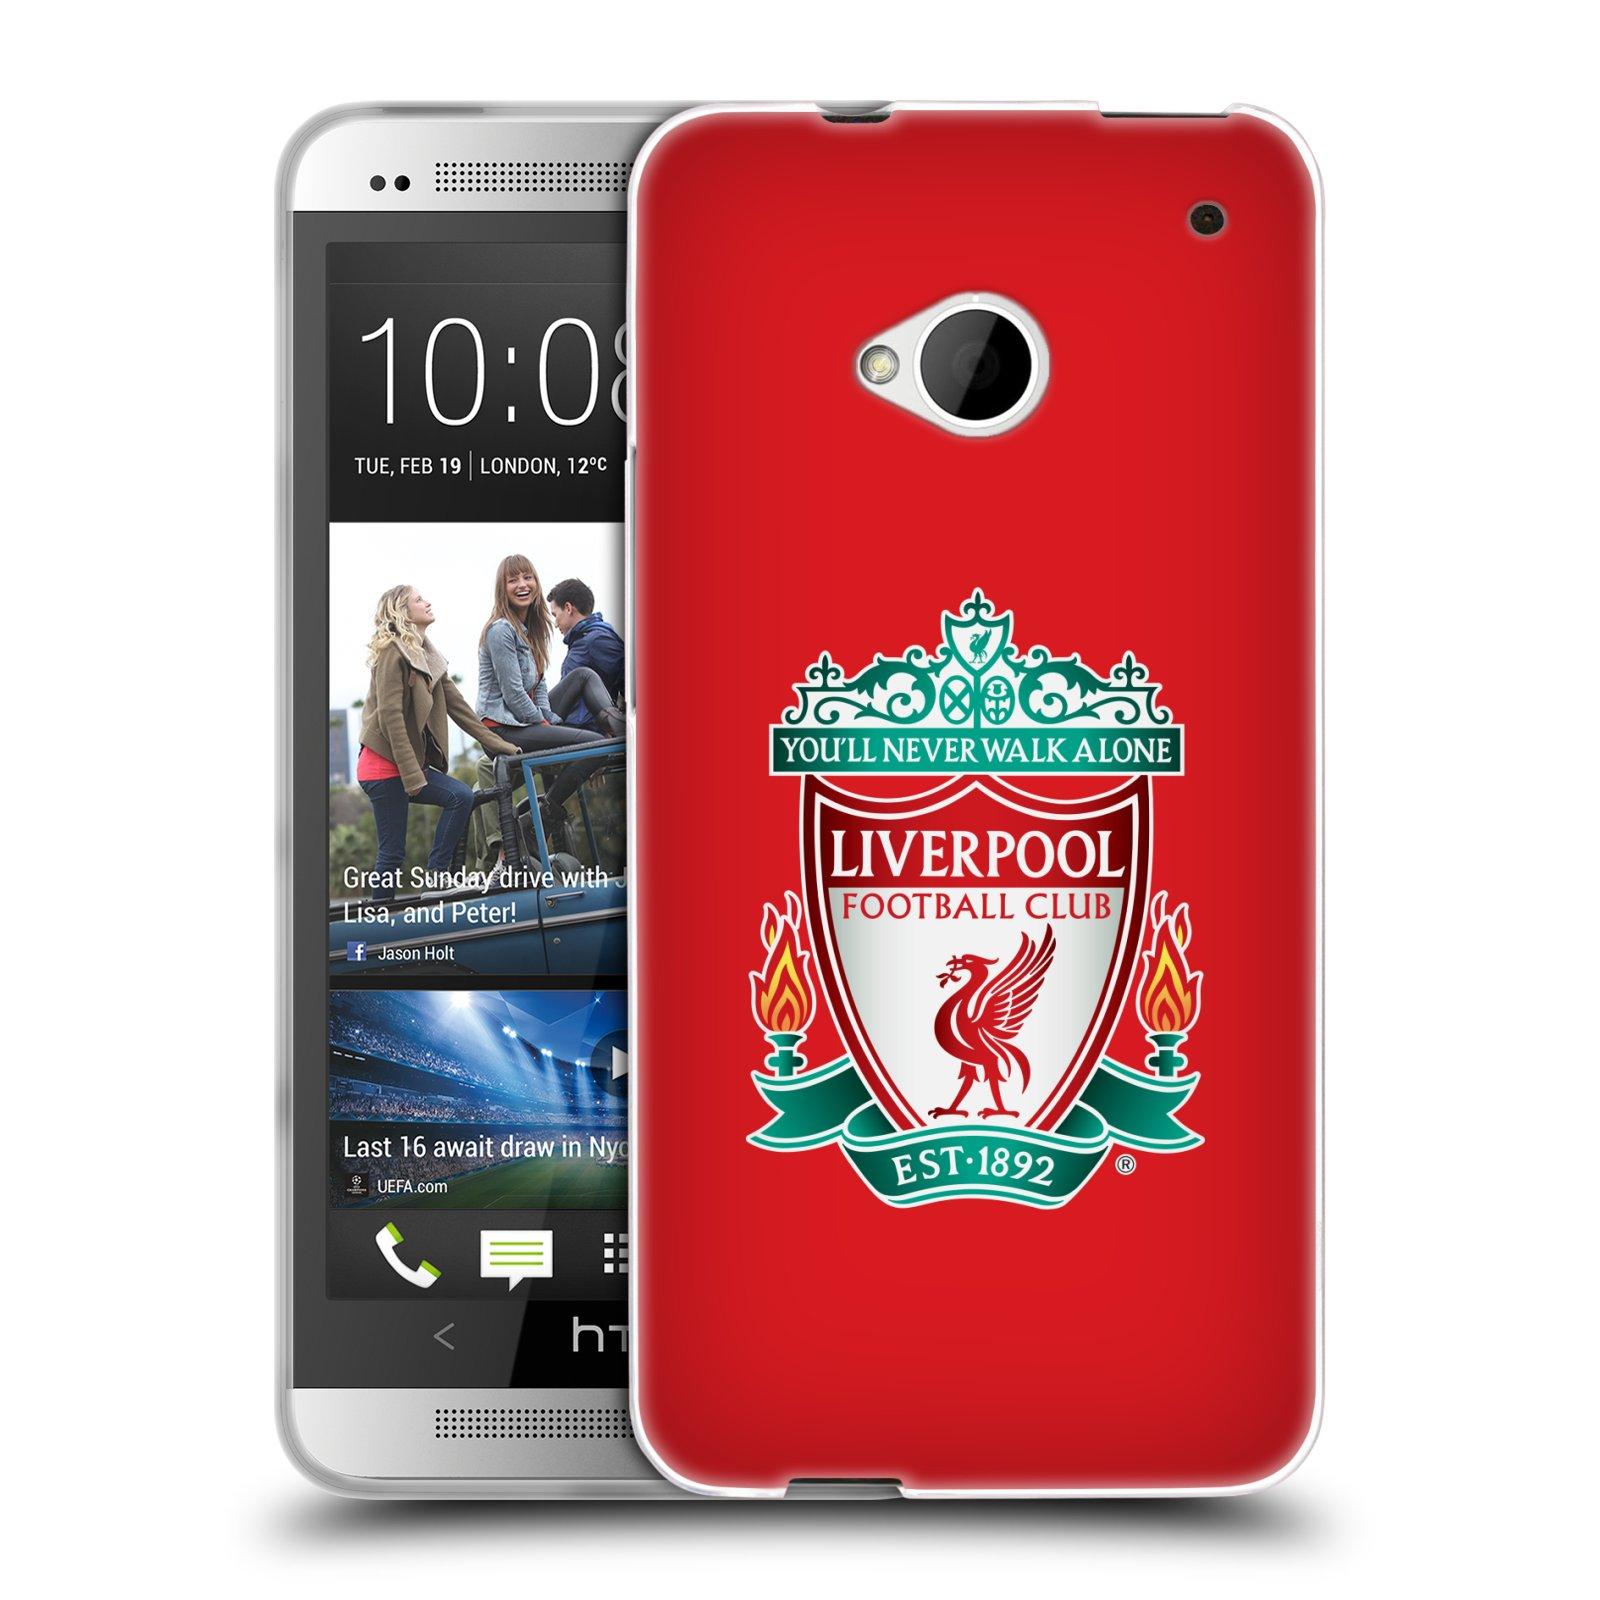 Silikonové pouzdro na mobil HTC ONE M7 HEAD CASE ZNAK LIVERPOOL FC OFFICIAL RED (Silikonový kryt či obal na mobilní telefon Liverpool FC Official pro HTC ONE M7)